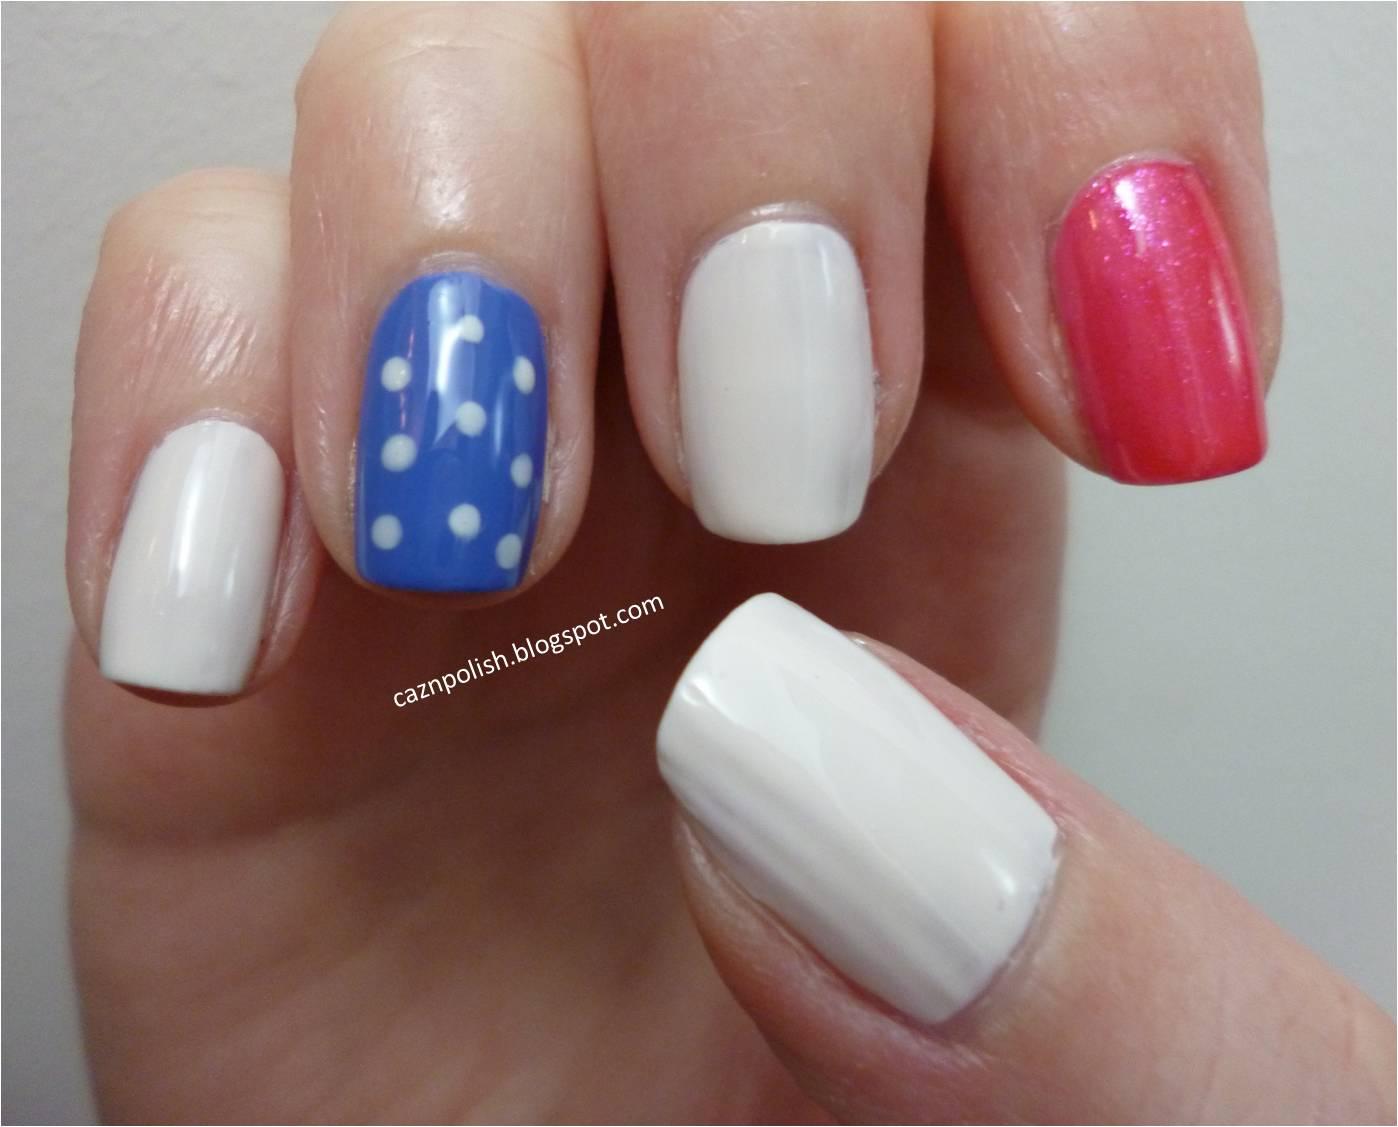 caz 'n' polish | Dotty Vintage Nails